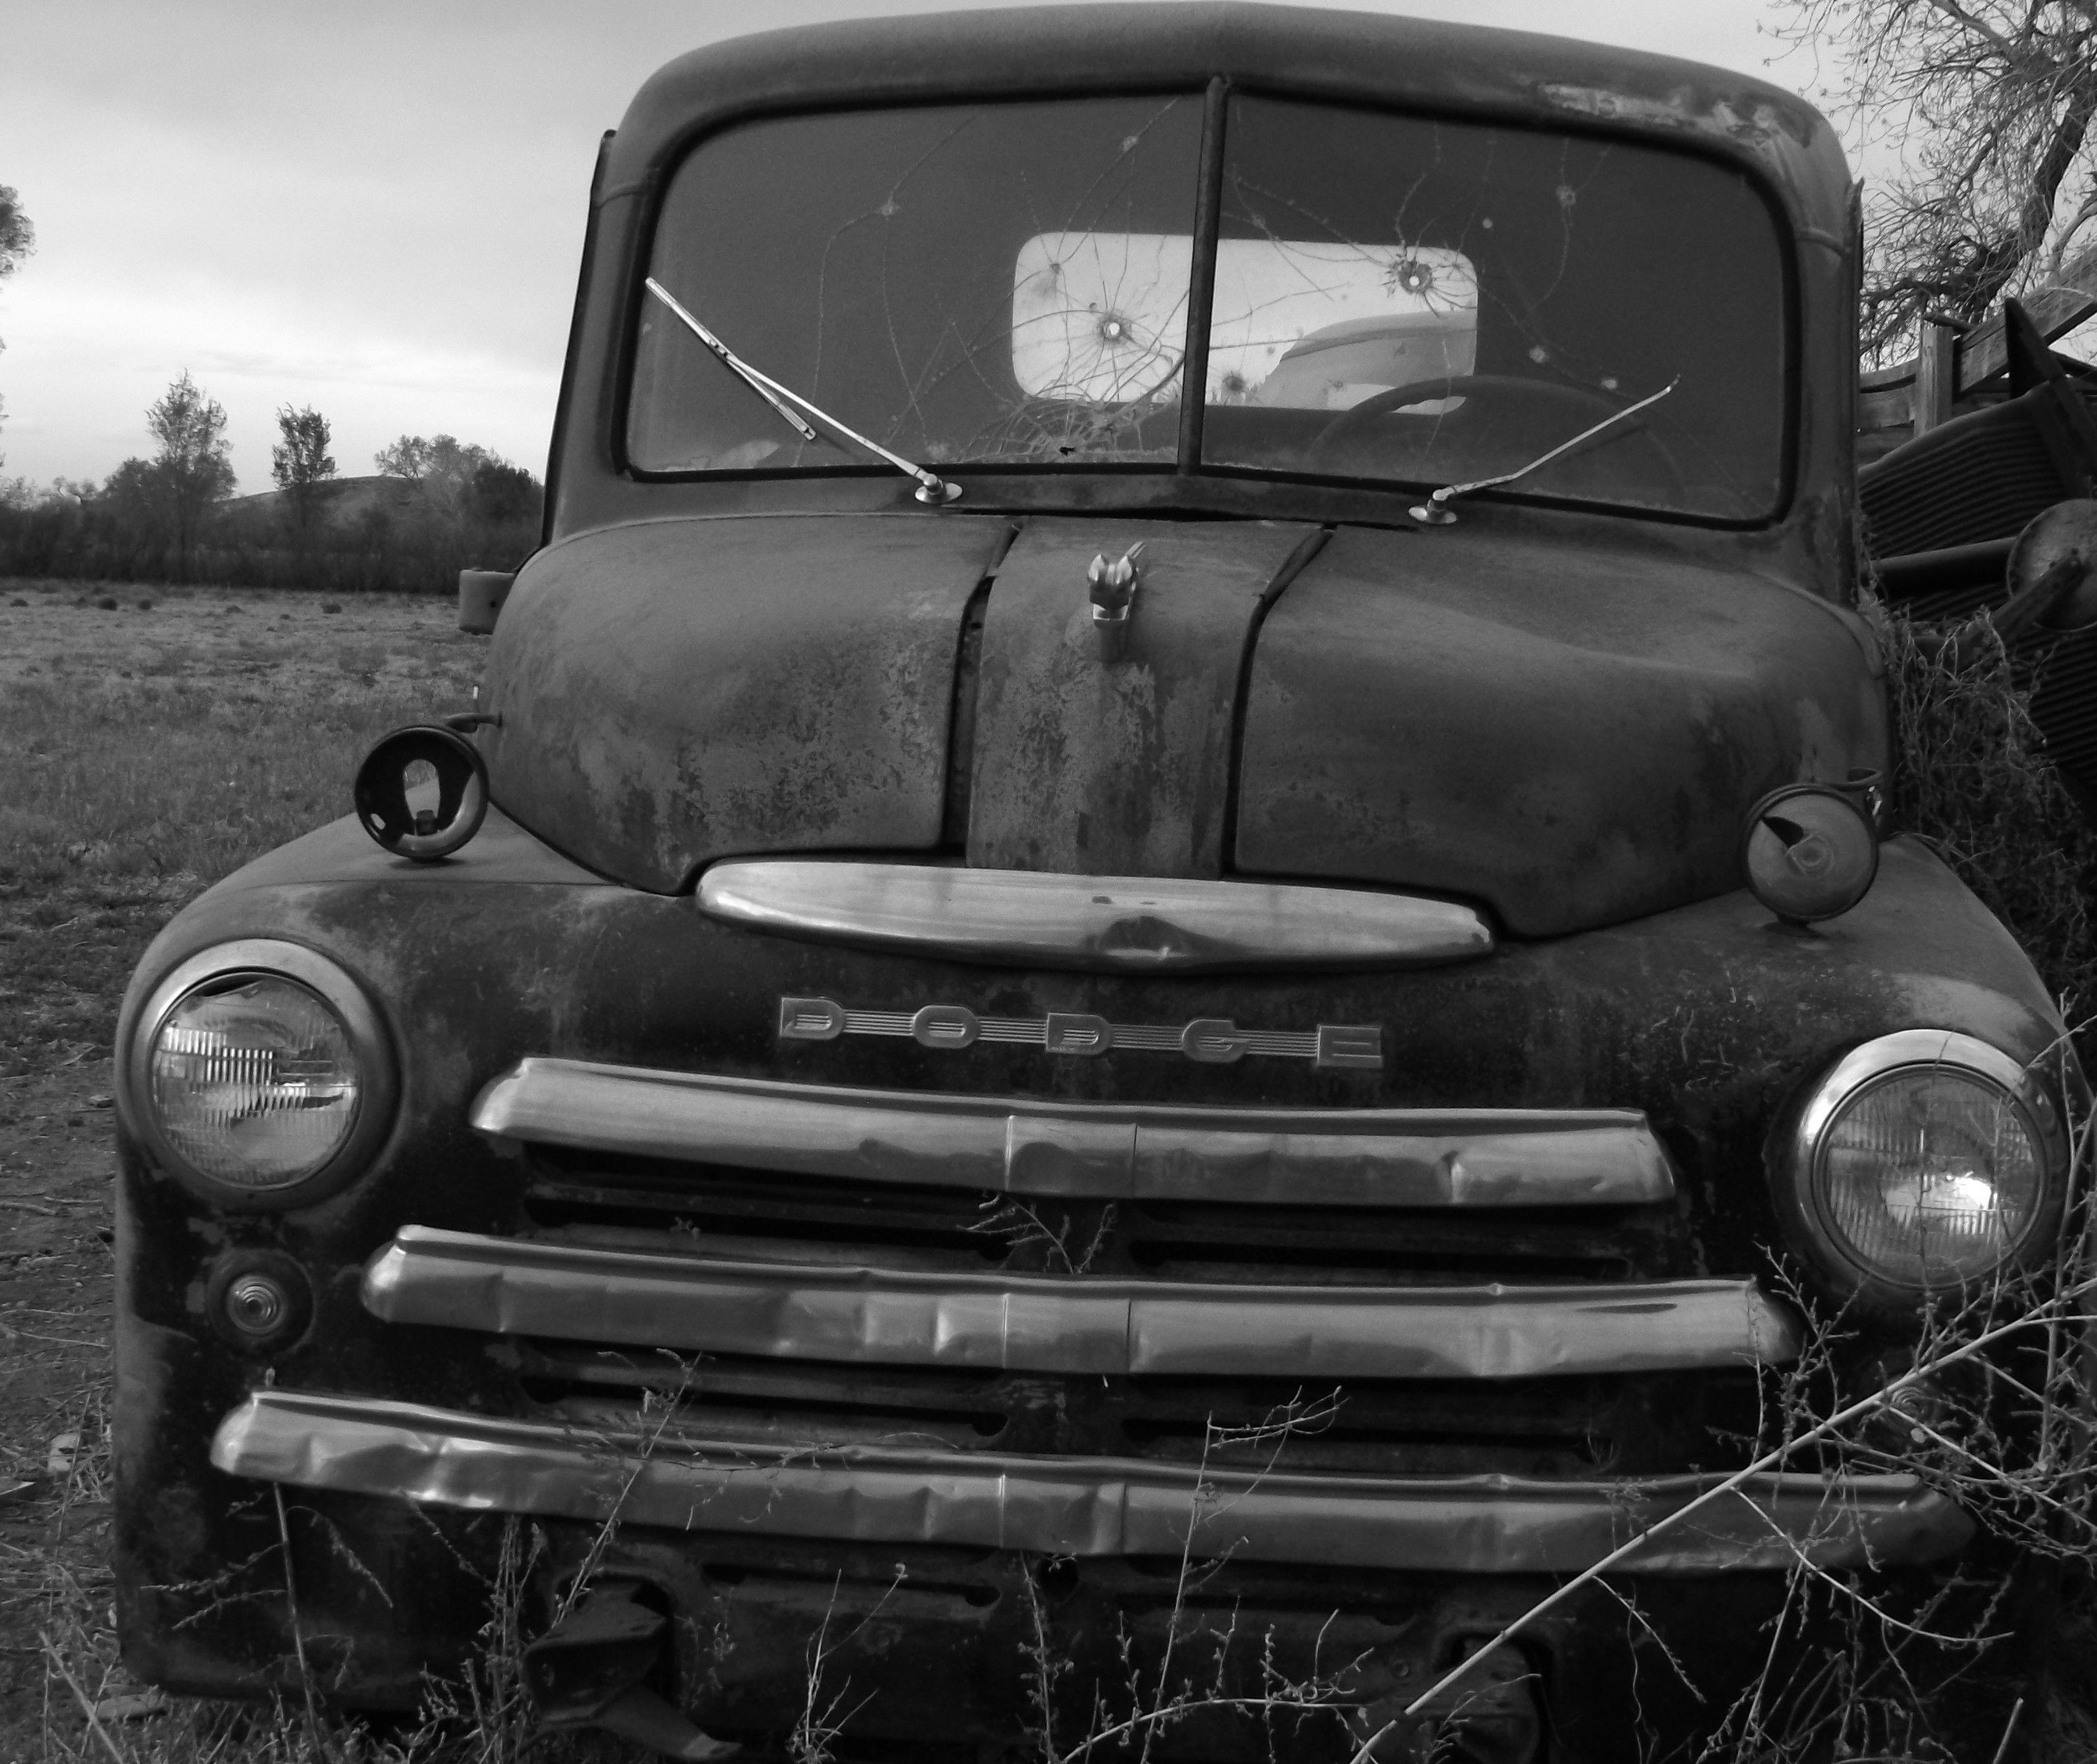 old Dodge truck photo print 5 x 7 | corinne art work | Pinterest